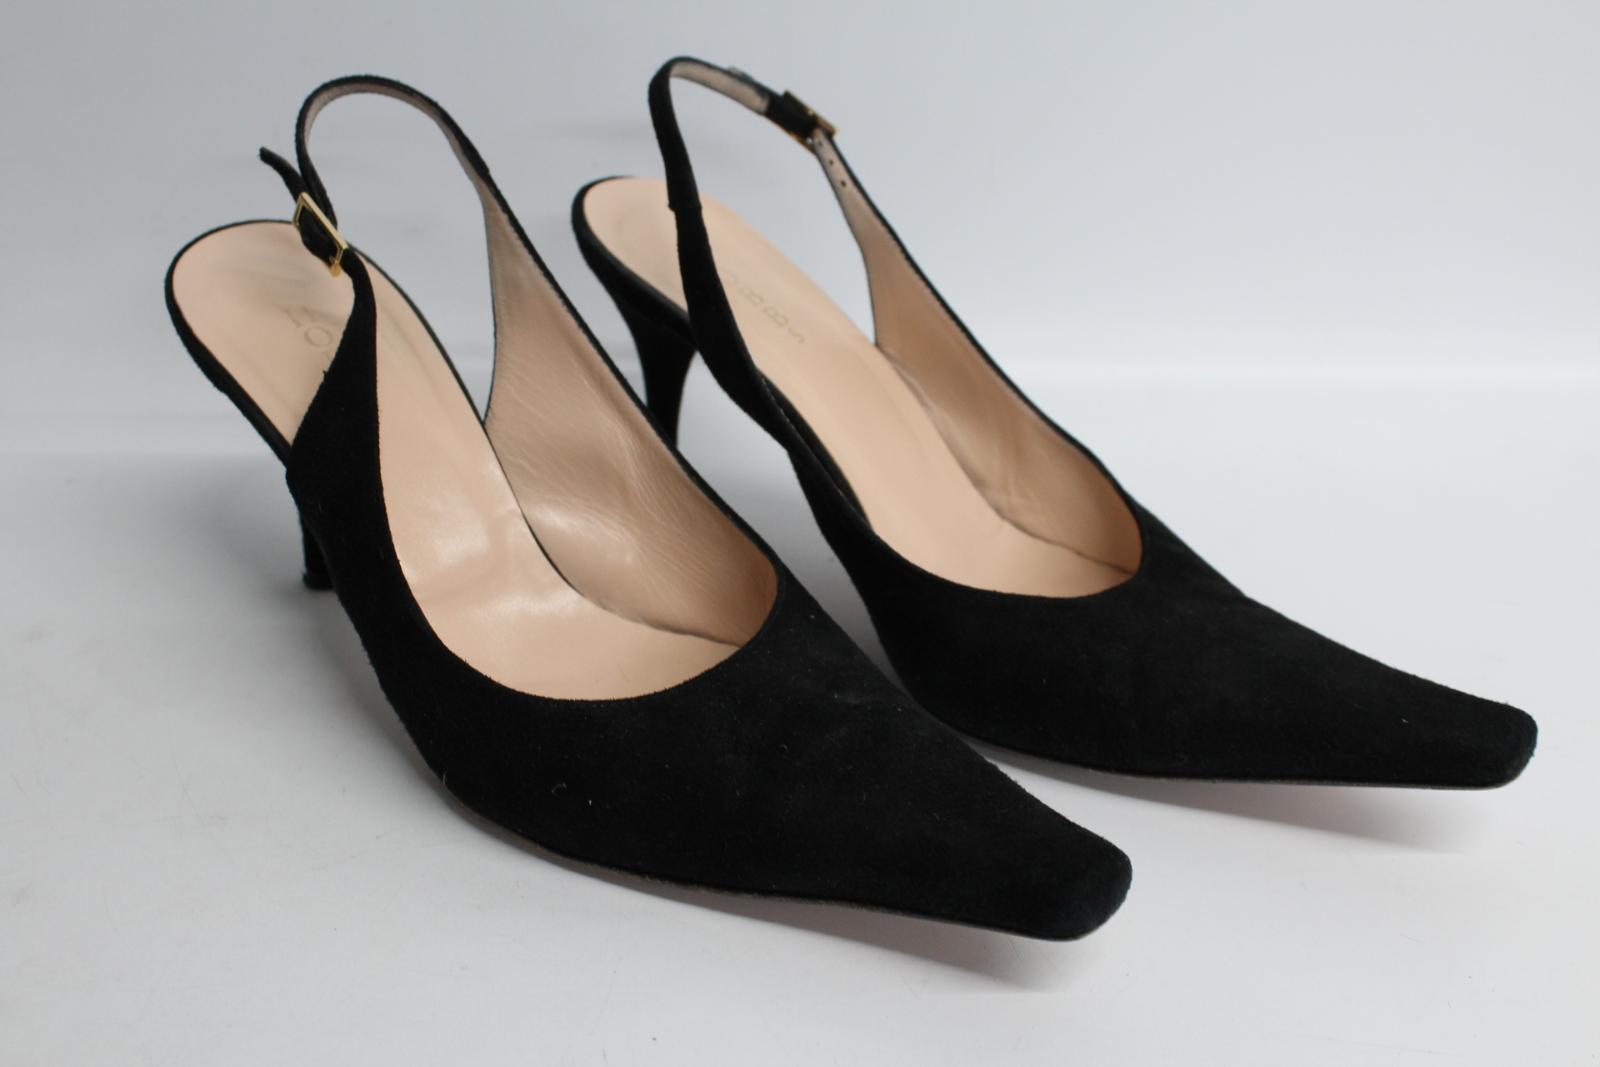 Hobbs-femmes-en-daim-noir-Sling-Arriere-bout-pointu-et-talon-aiguille-Chaussure-UK6-5-EU39-5 miniature 4